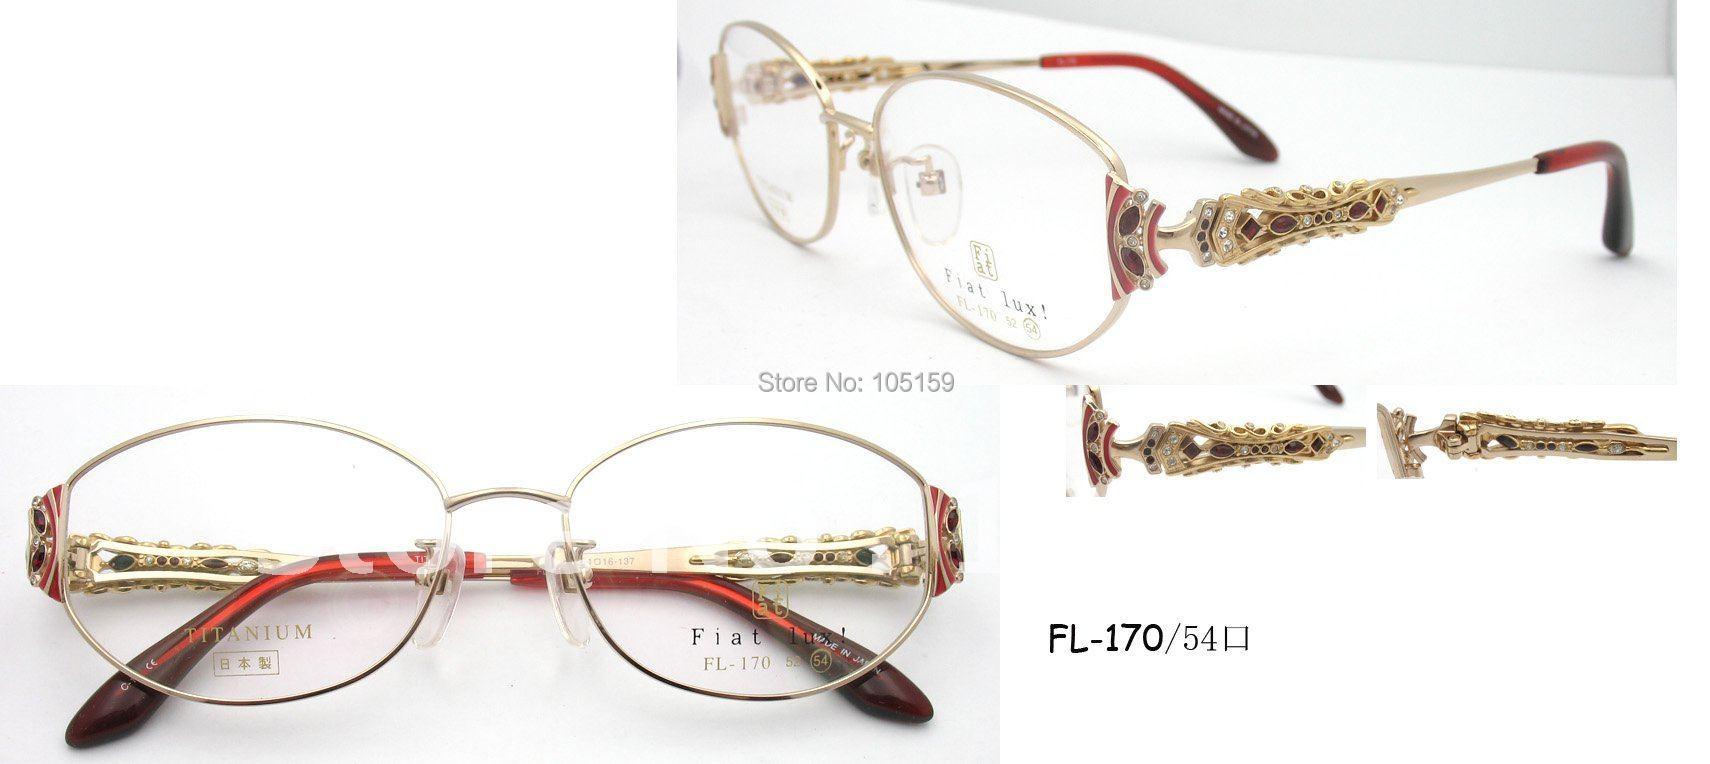 Eyewear Frames From Japan : Brand glasses,Japan Original titanium optical frames,high ...